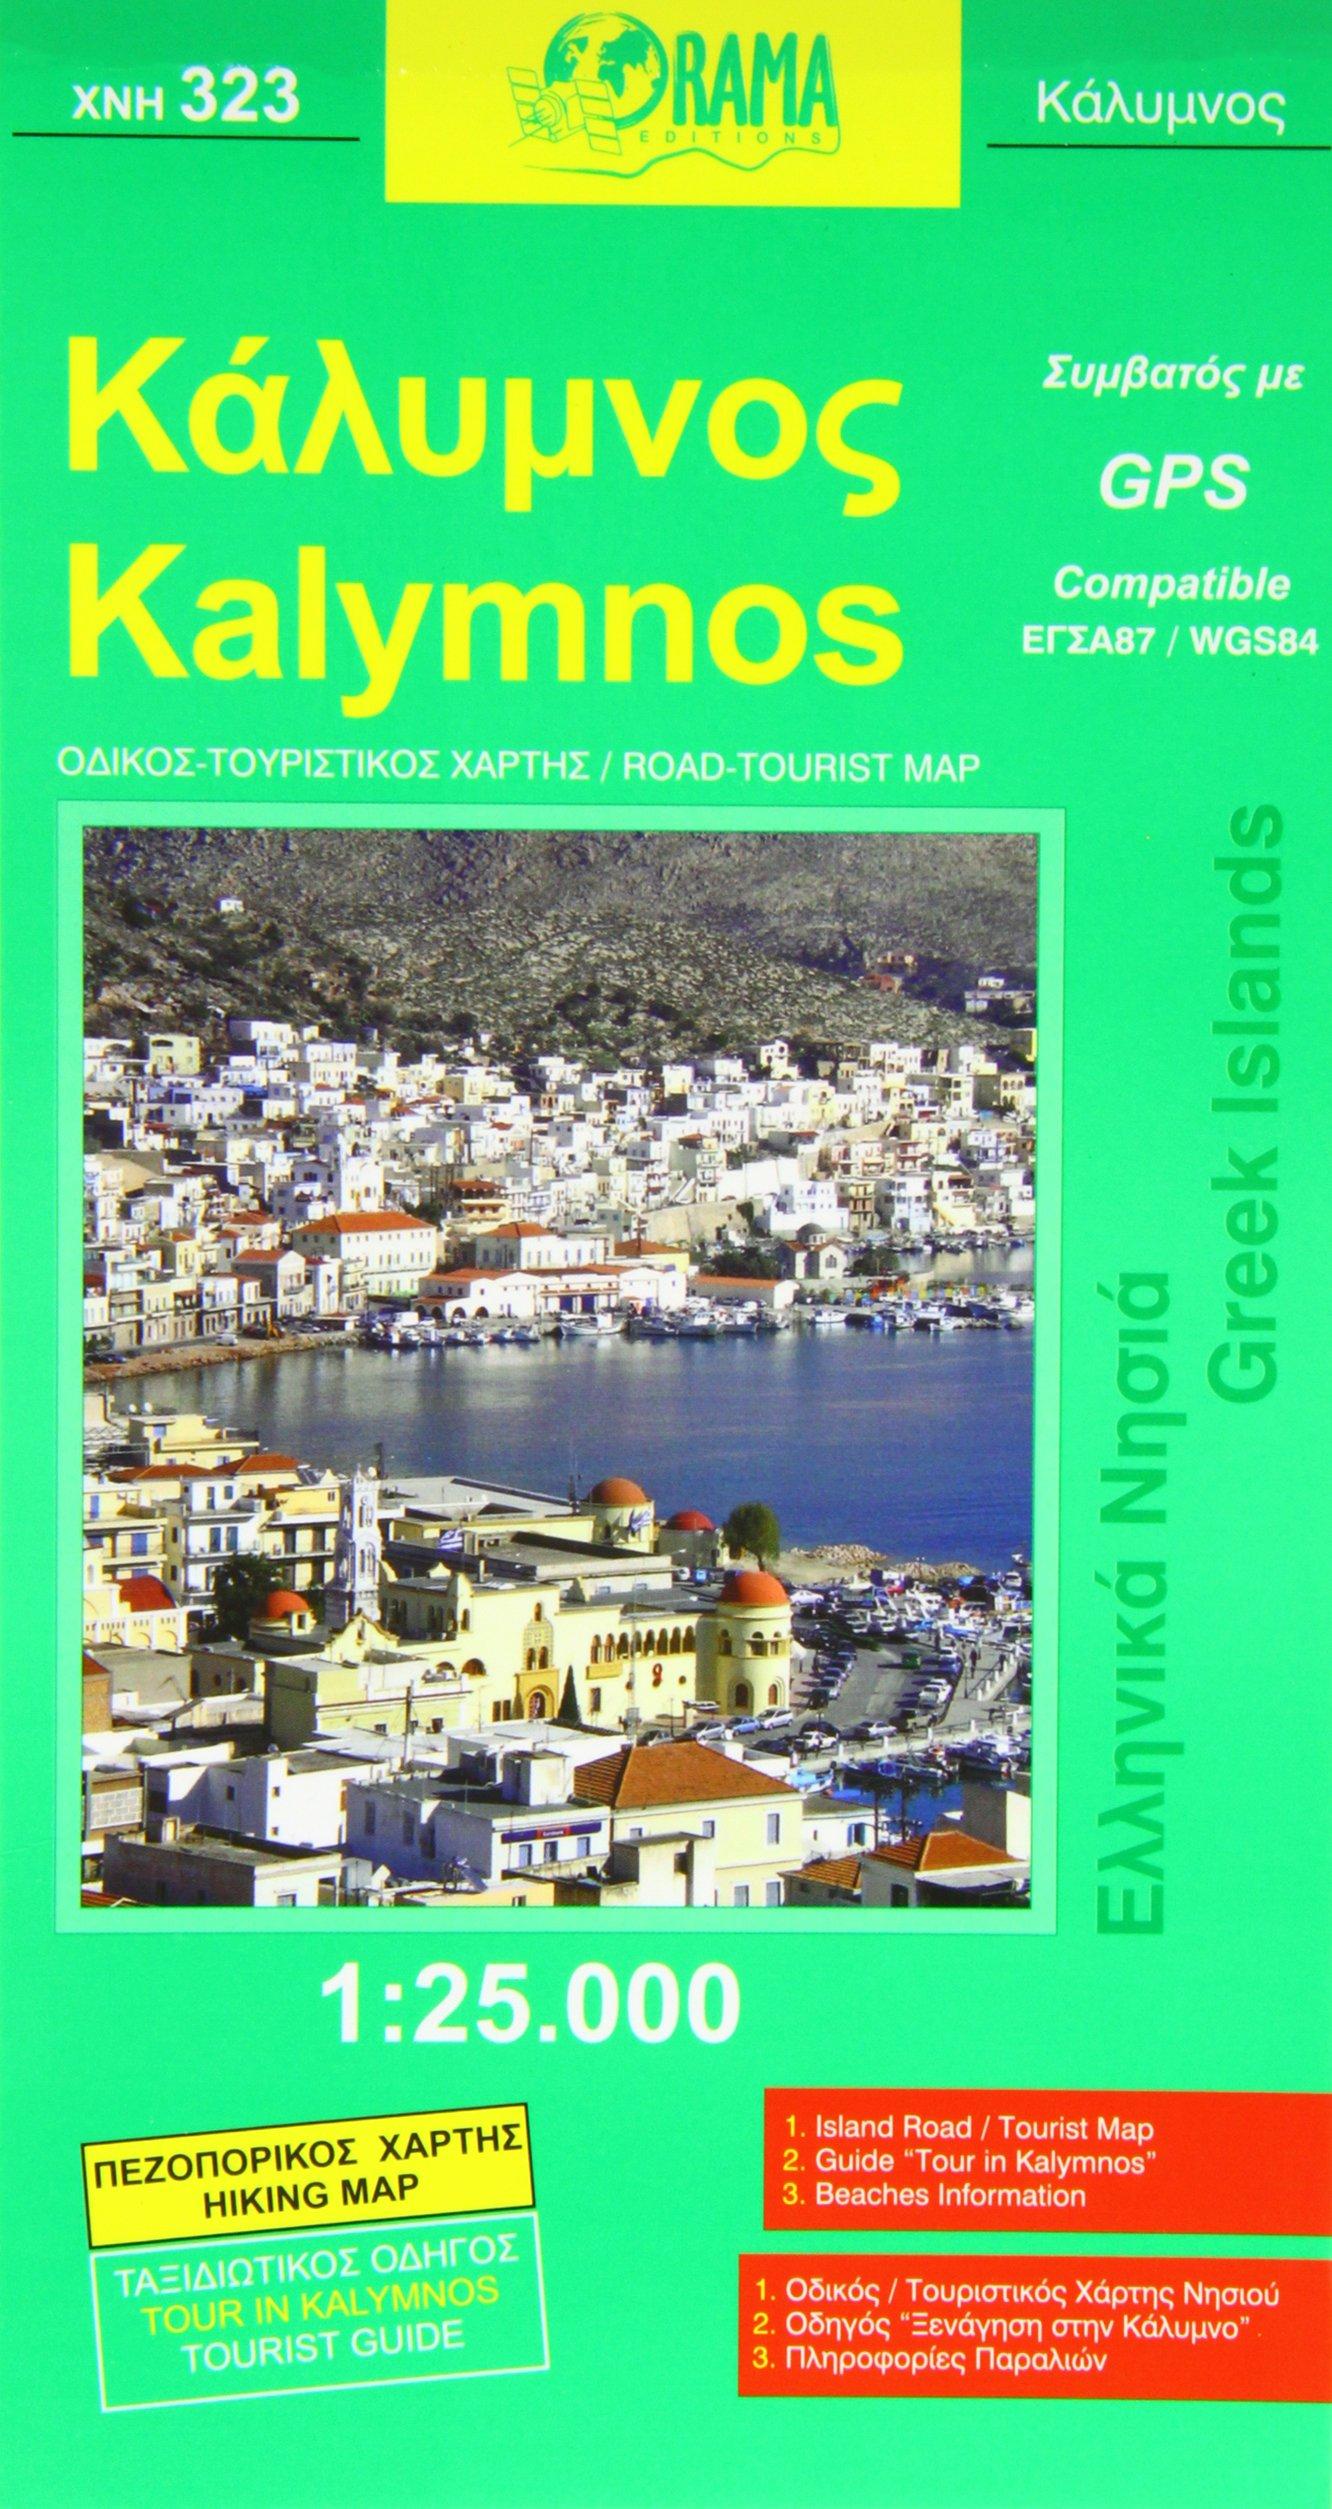 Kalymnos ORAMA2323 collective 9789608385856 Amazoncom Books